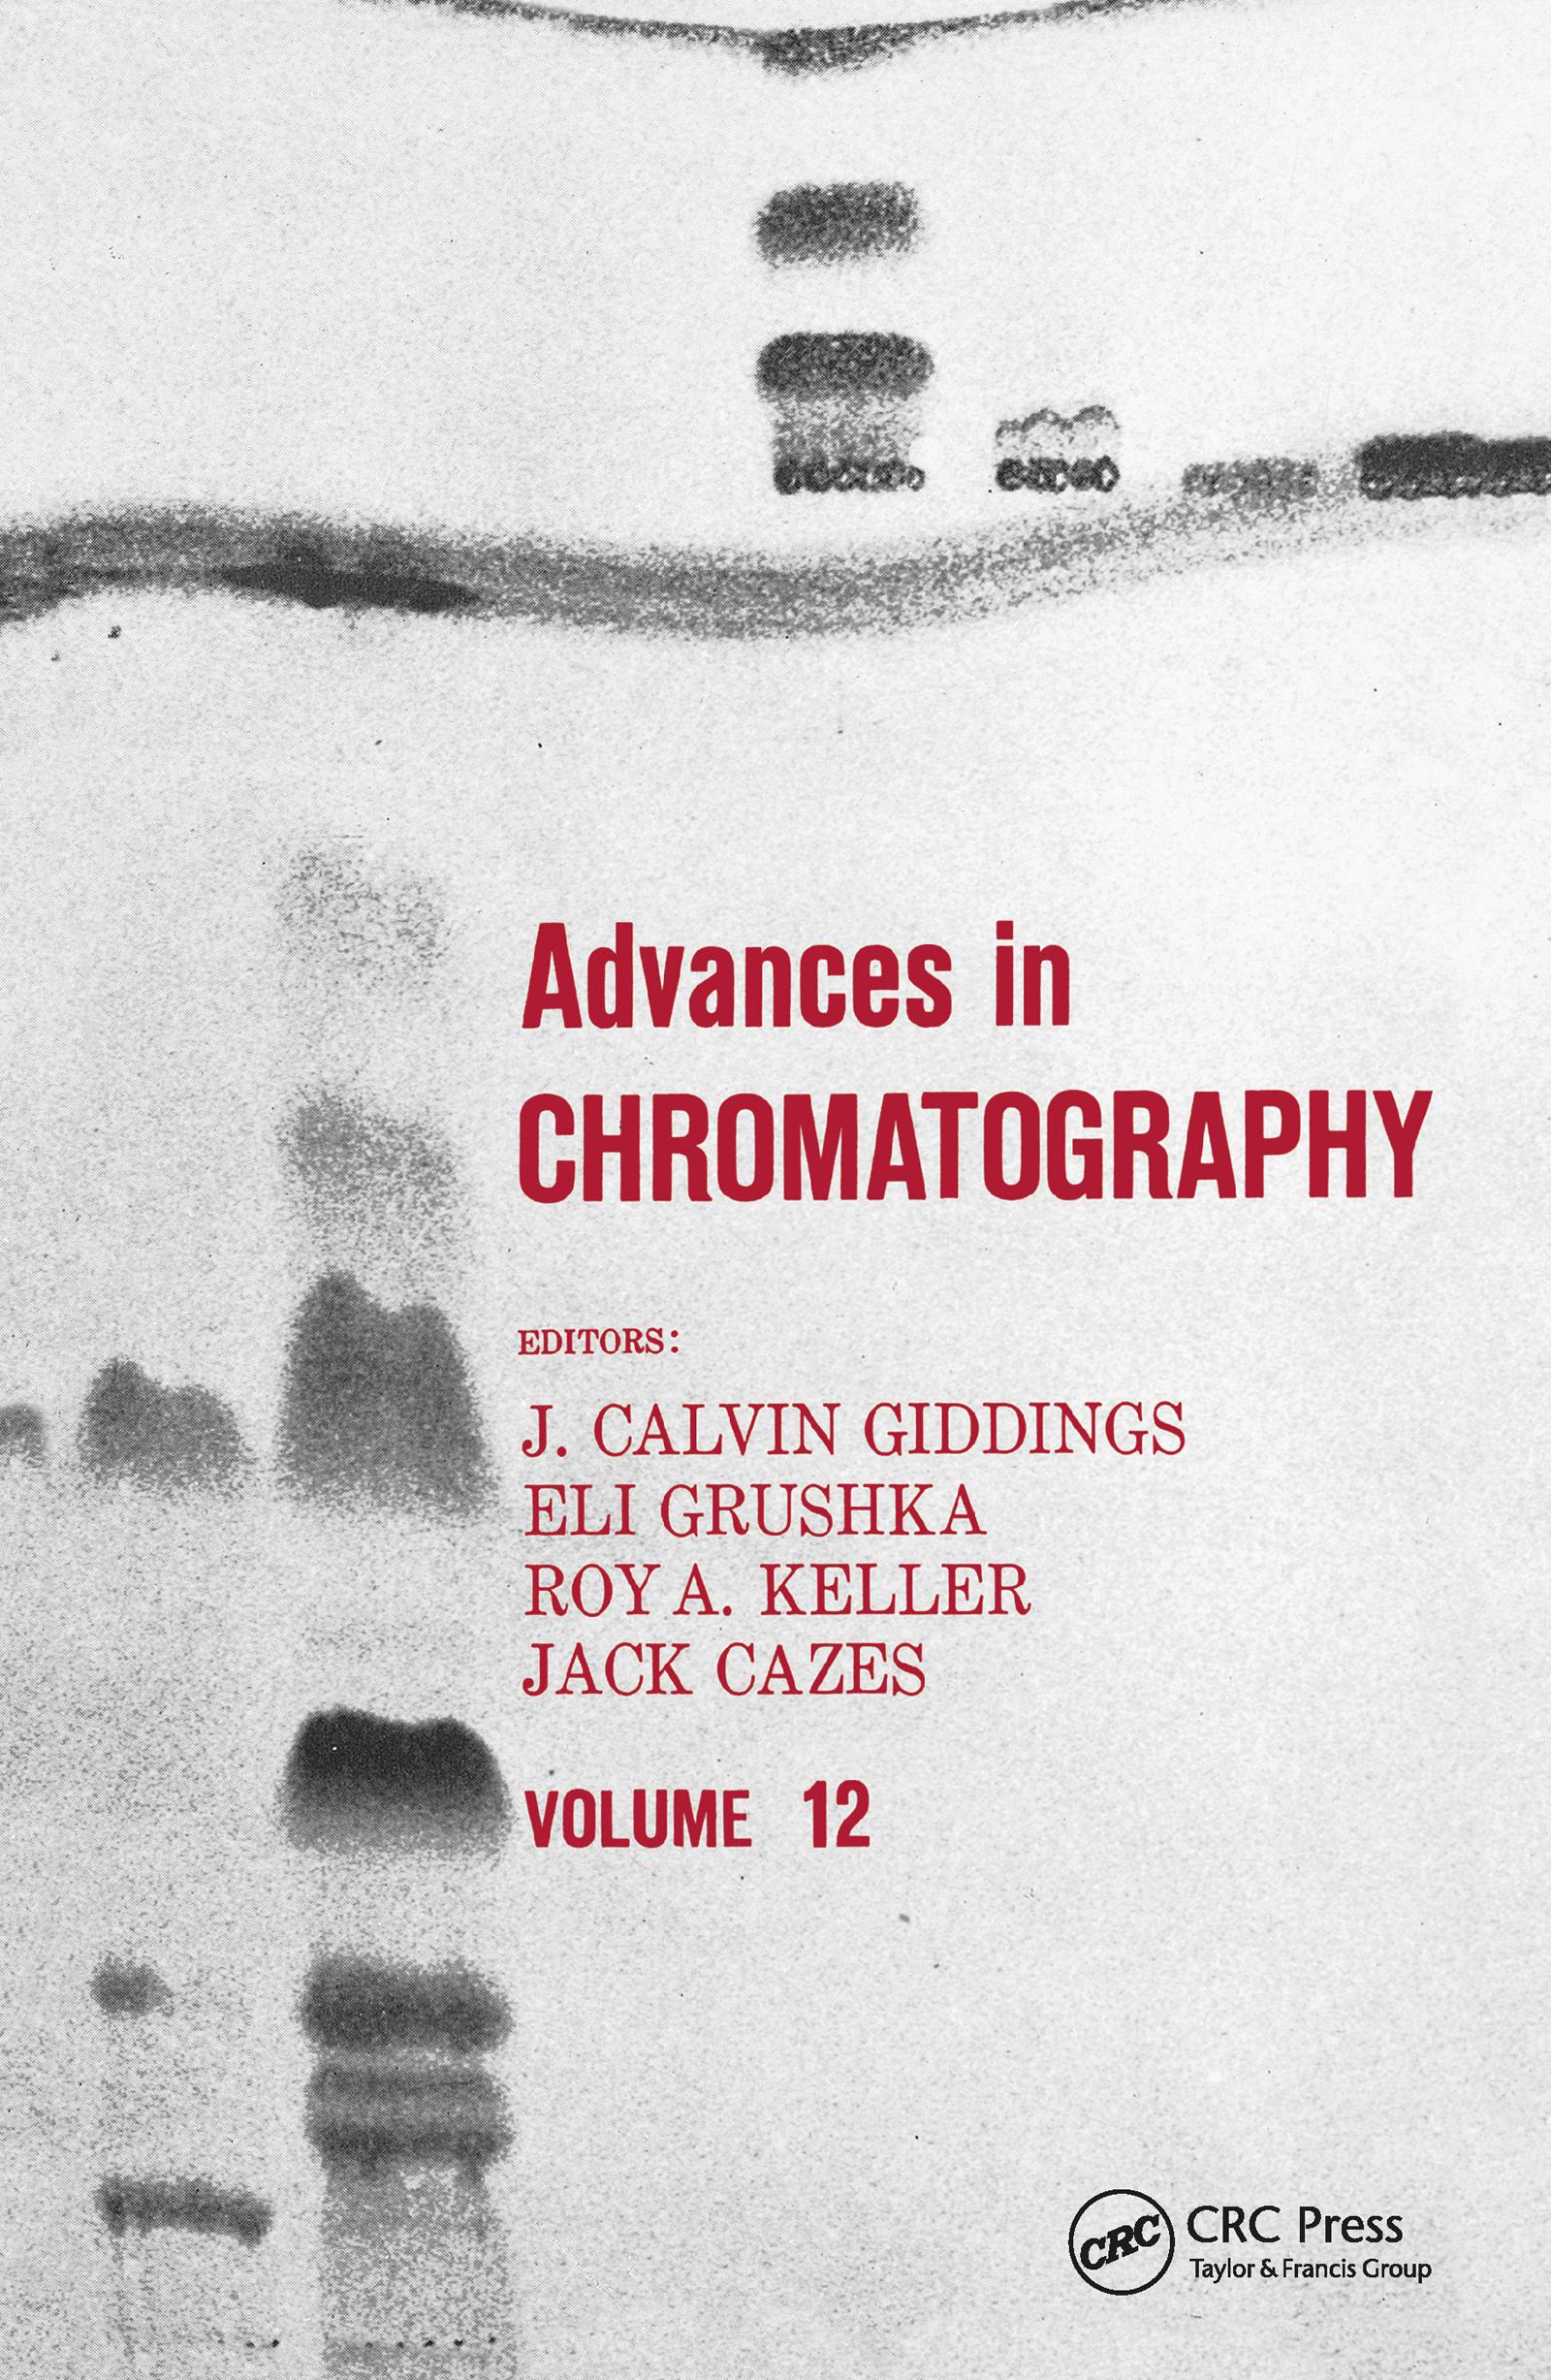 Advances in Chromatography: Volume 12 book cover